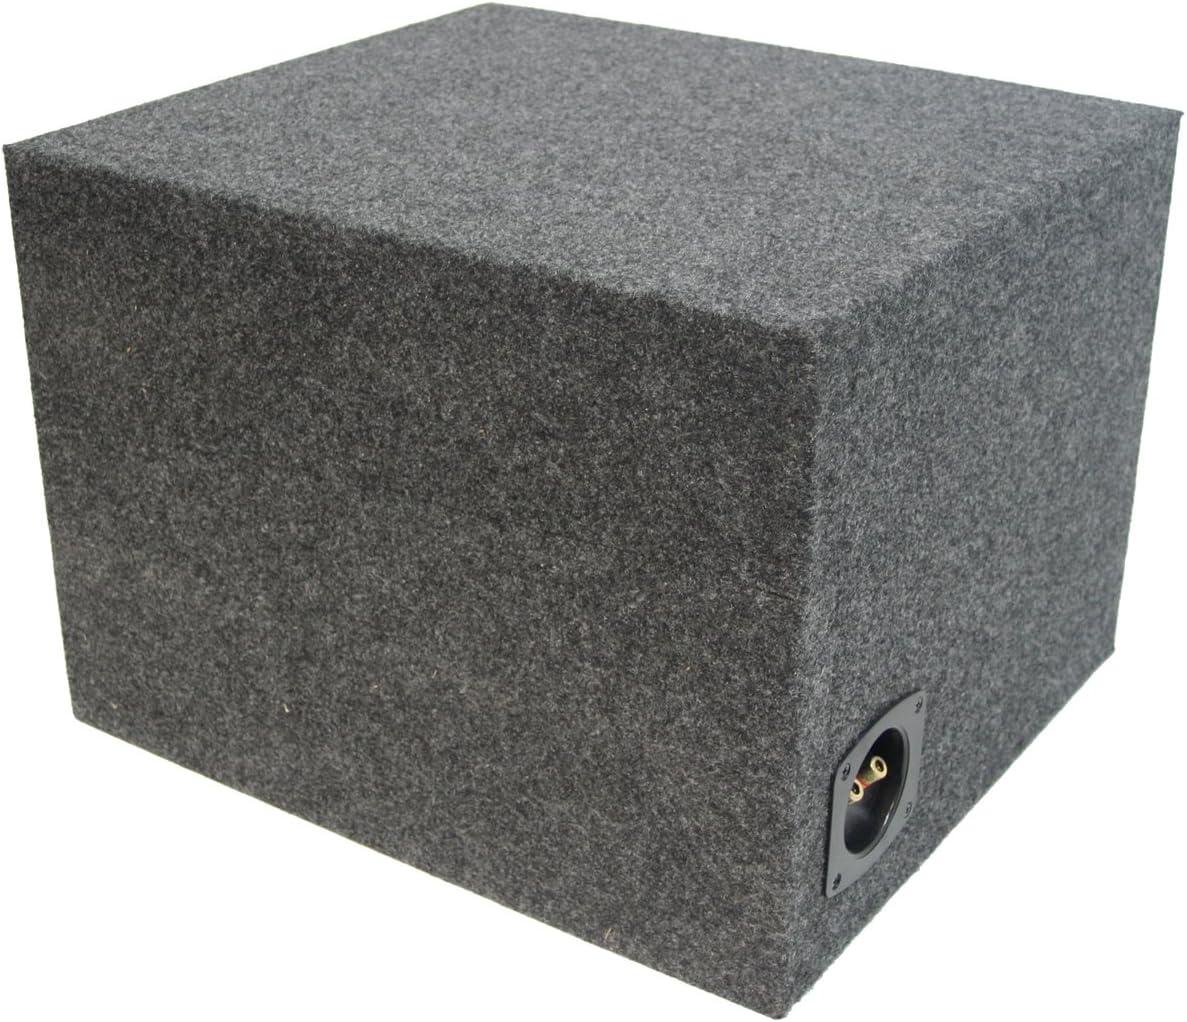 Renewed Kicker 44L7S102 Car Audio Solo-Baric 10 Subwoofer Square L7 Dual 2 Ohm Sub